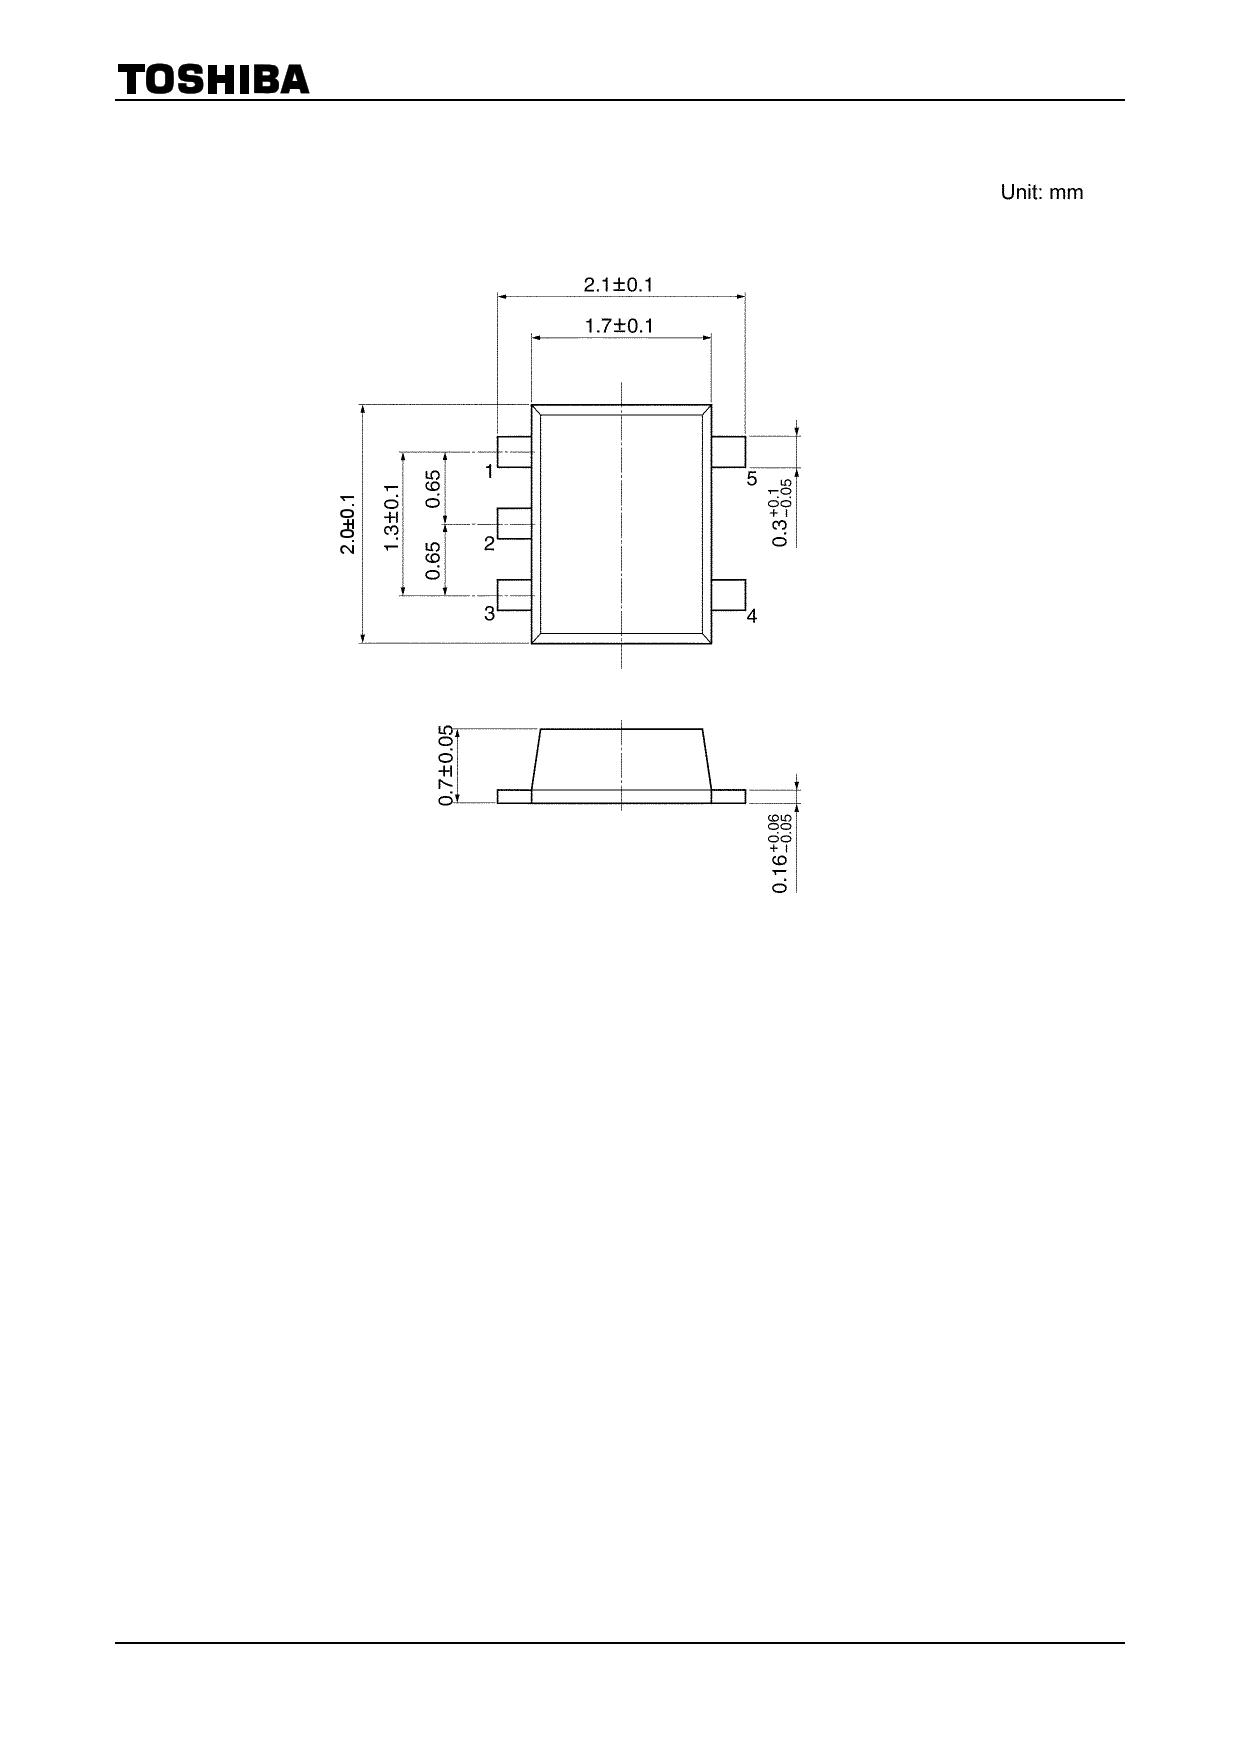 TCS10NPU pdf, 반도체, 판매, 대치품